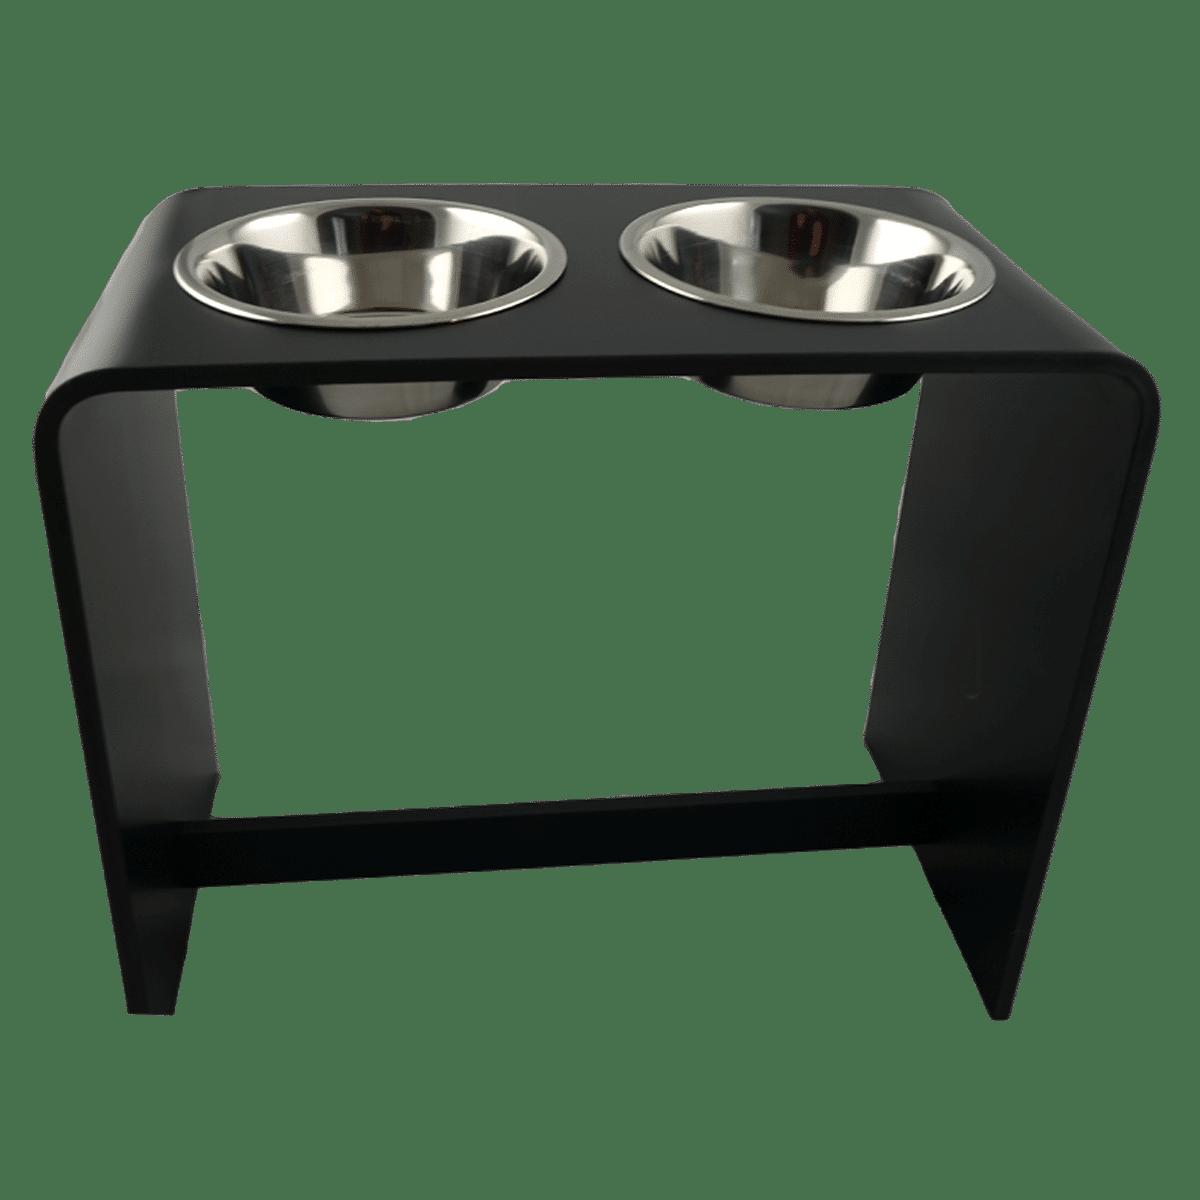 Snygg matbar till den stora hunden - outlet